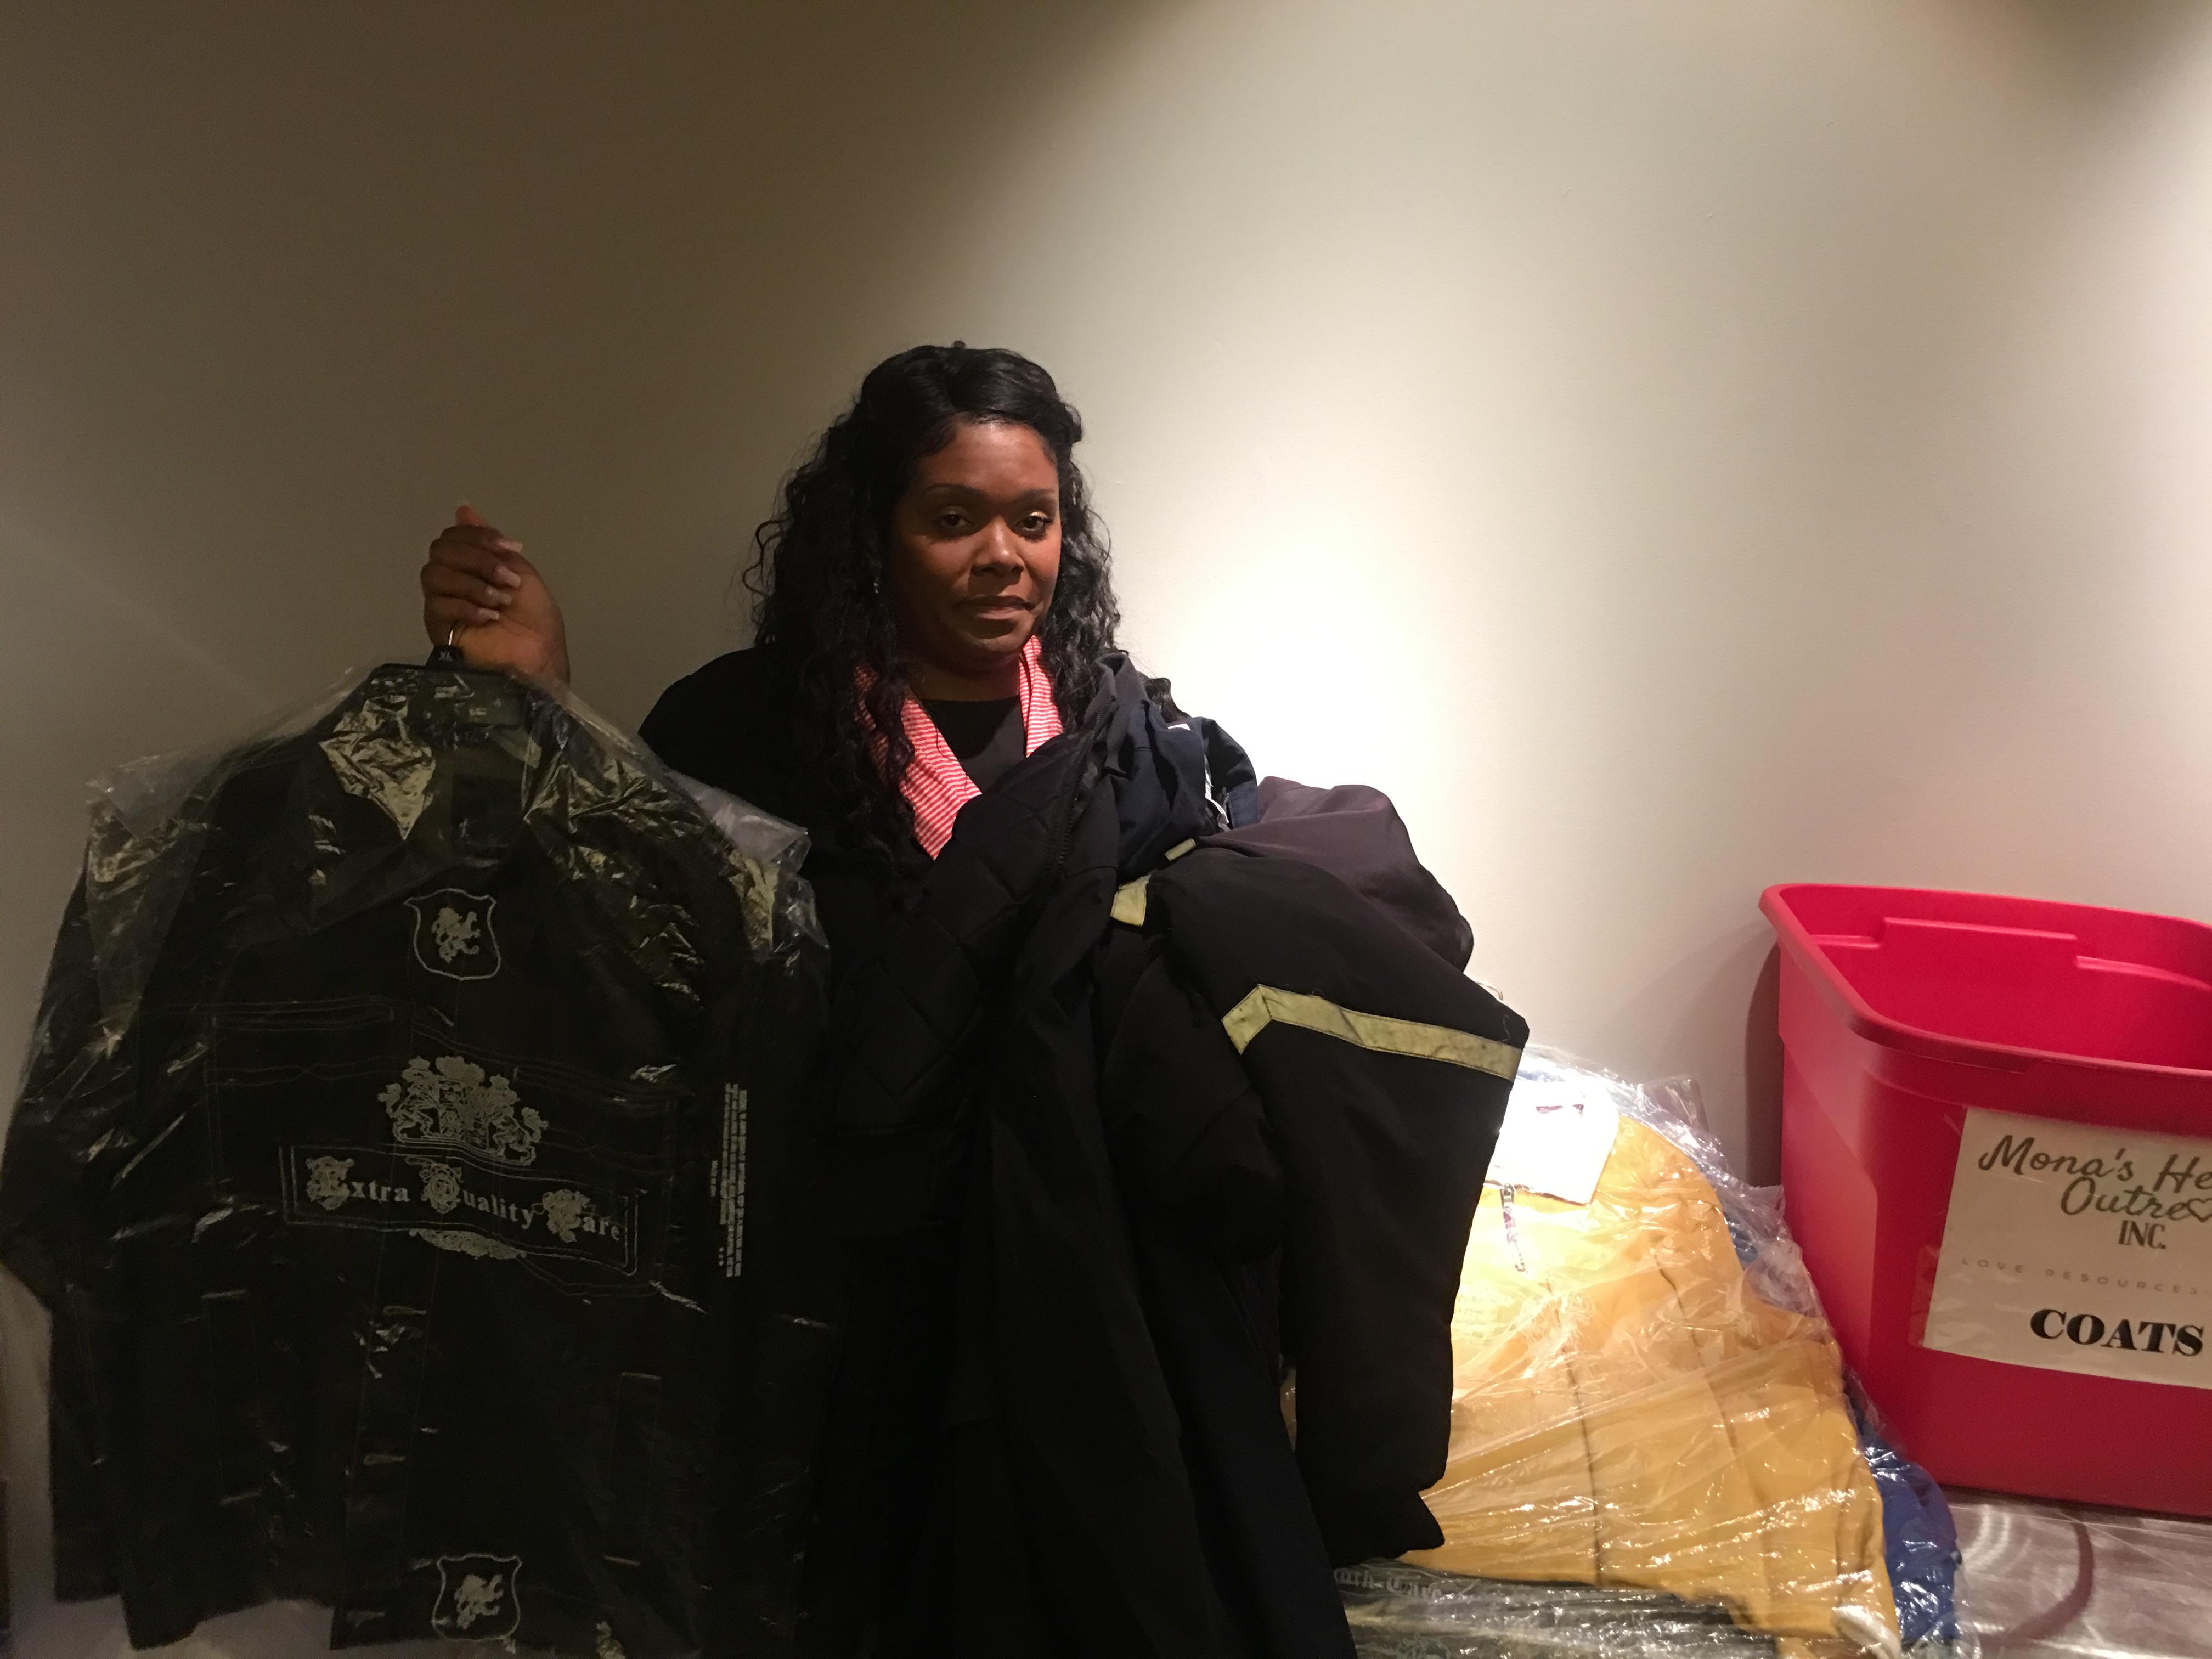 Mona's Heart Outreach has an annual coat drive